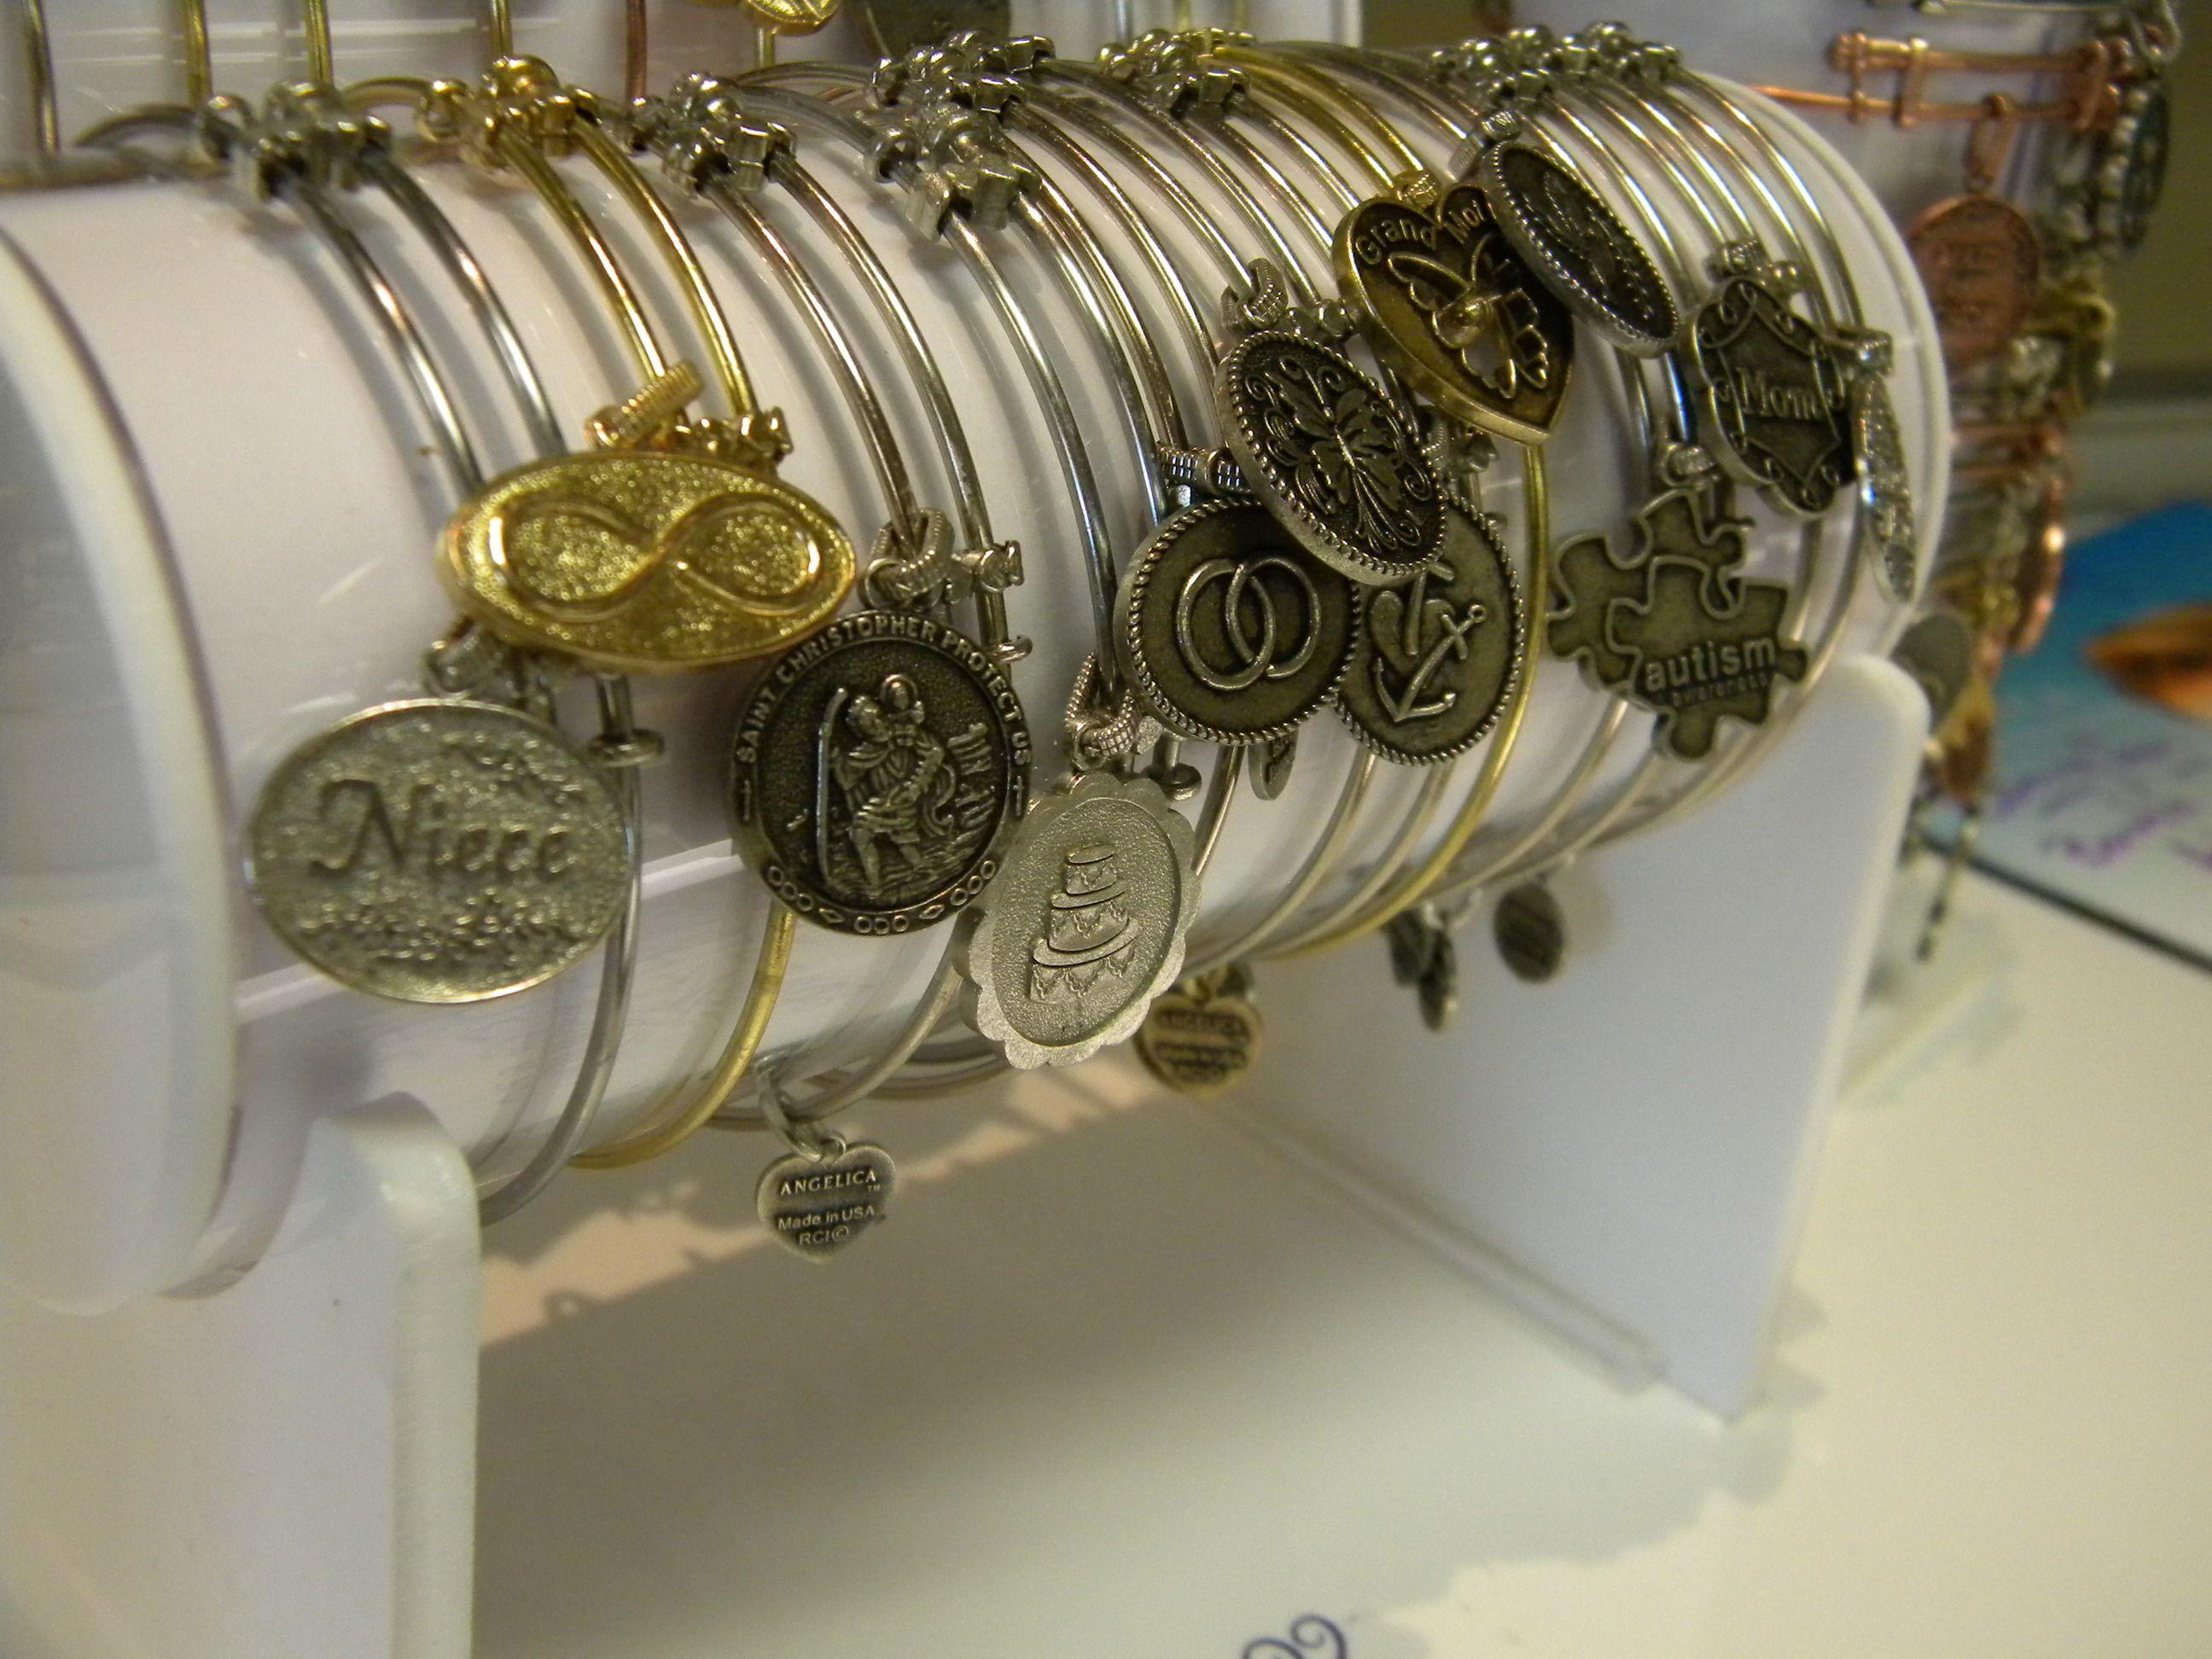 36+ Jewelry stores in lapeer mi ideas in 2021